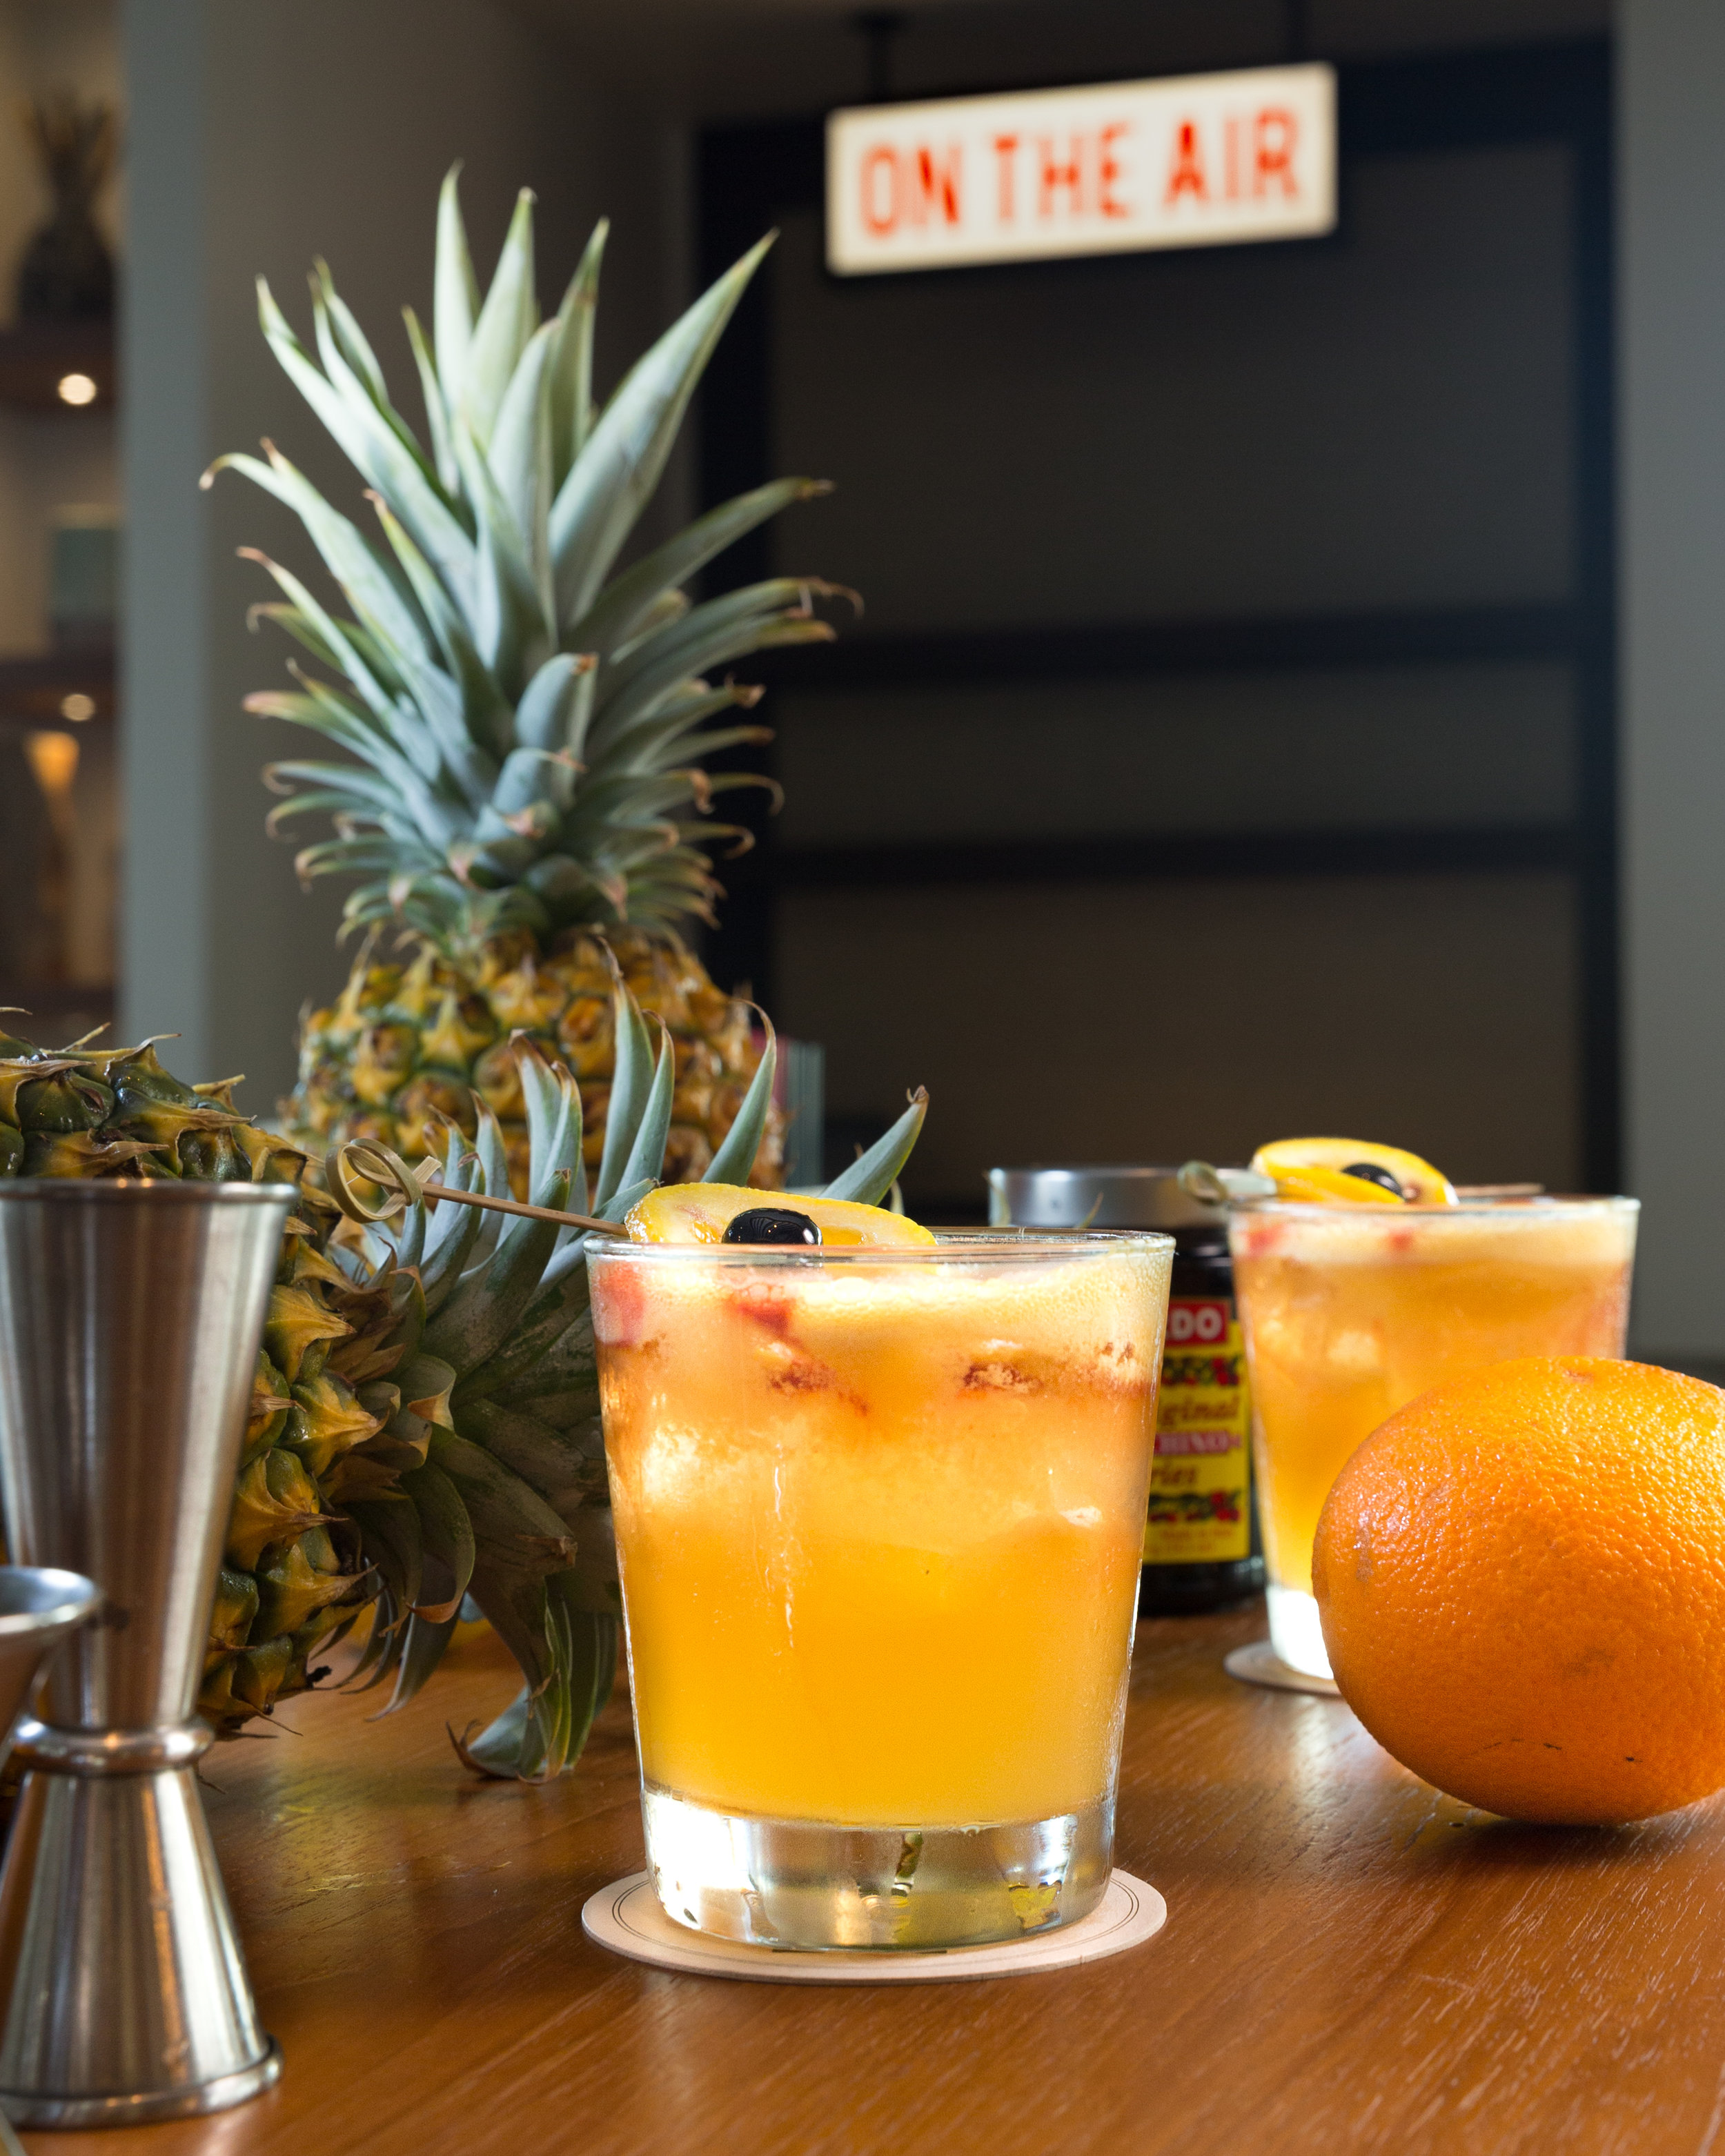 Humble Market Kitchin_ALOHA FRIDAY-Bacardi Maestro Silver Rum | Amaretto | Aperol Drizzle |-Shaken with Pineapple and Lemon__ Craig Bixel_07-2017.jpg